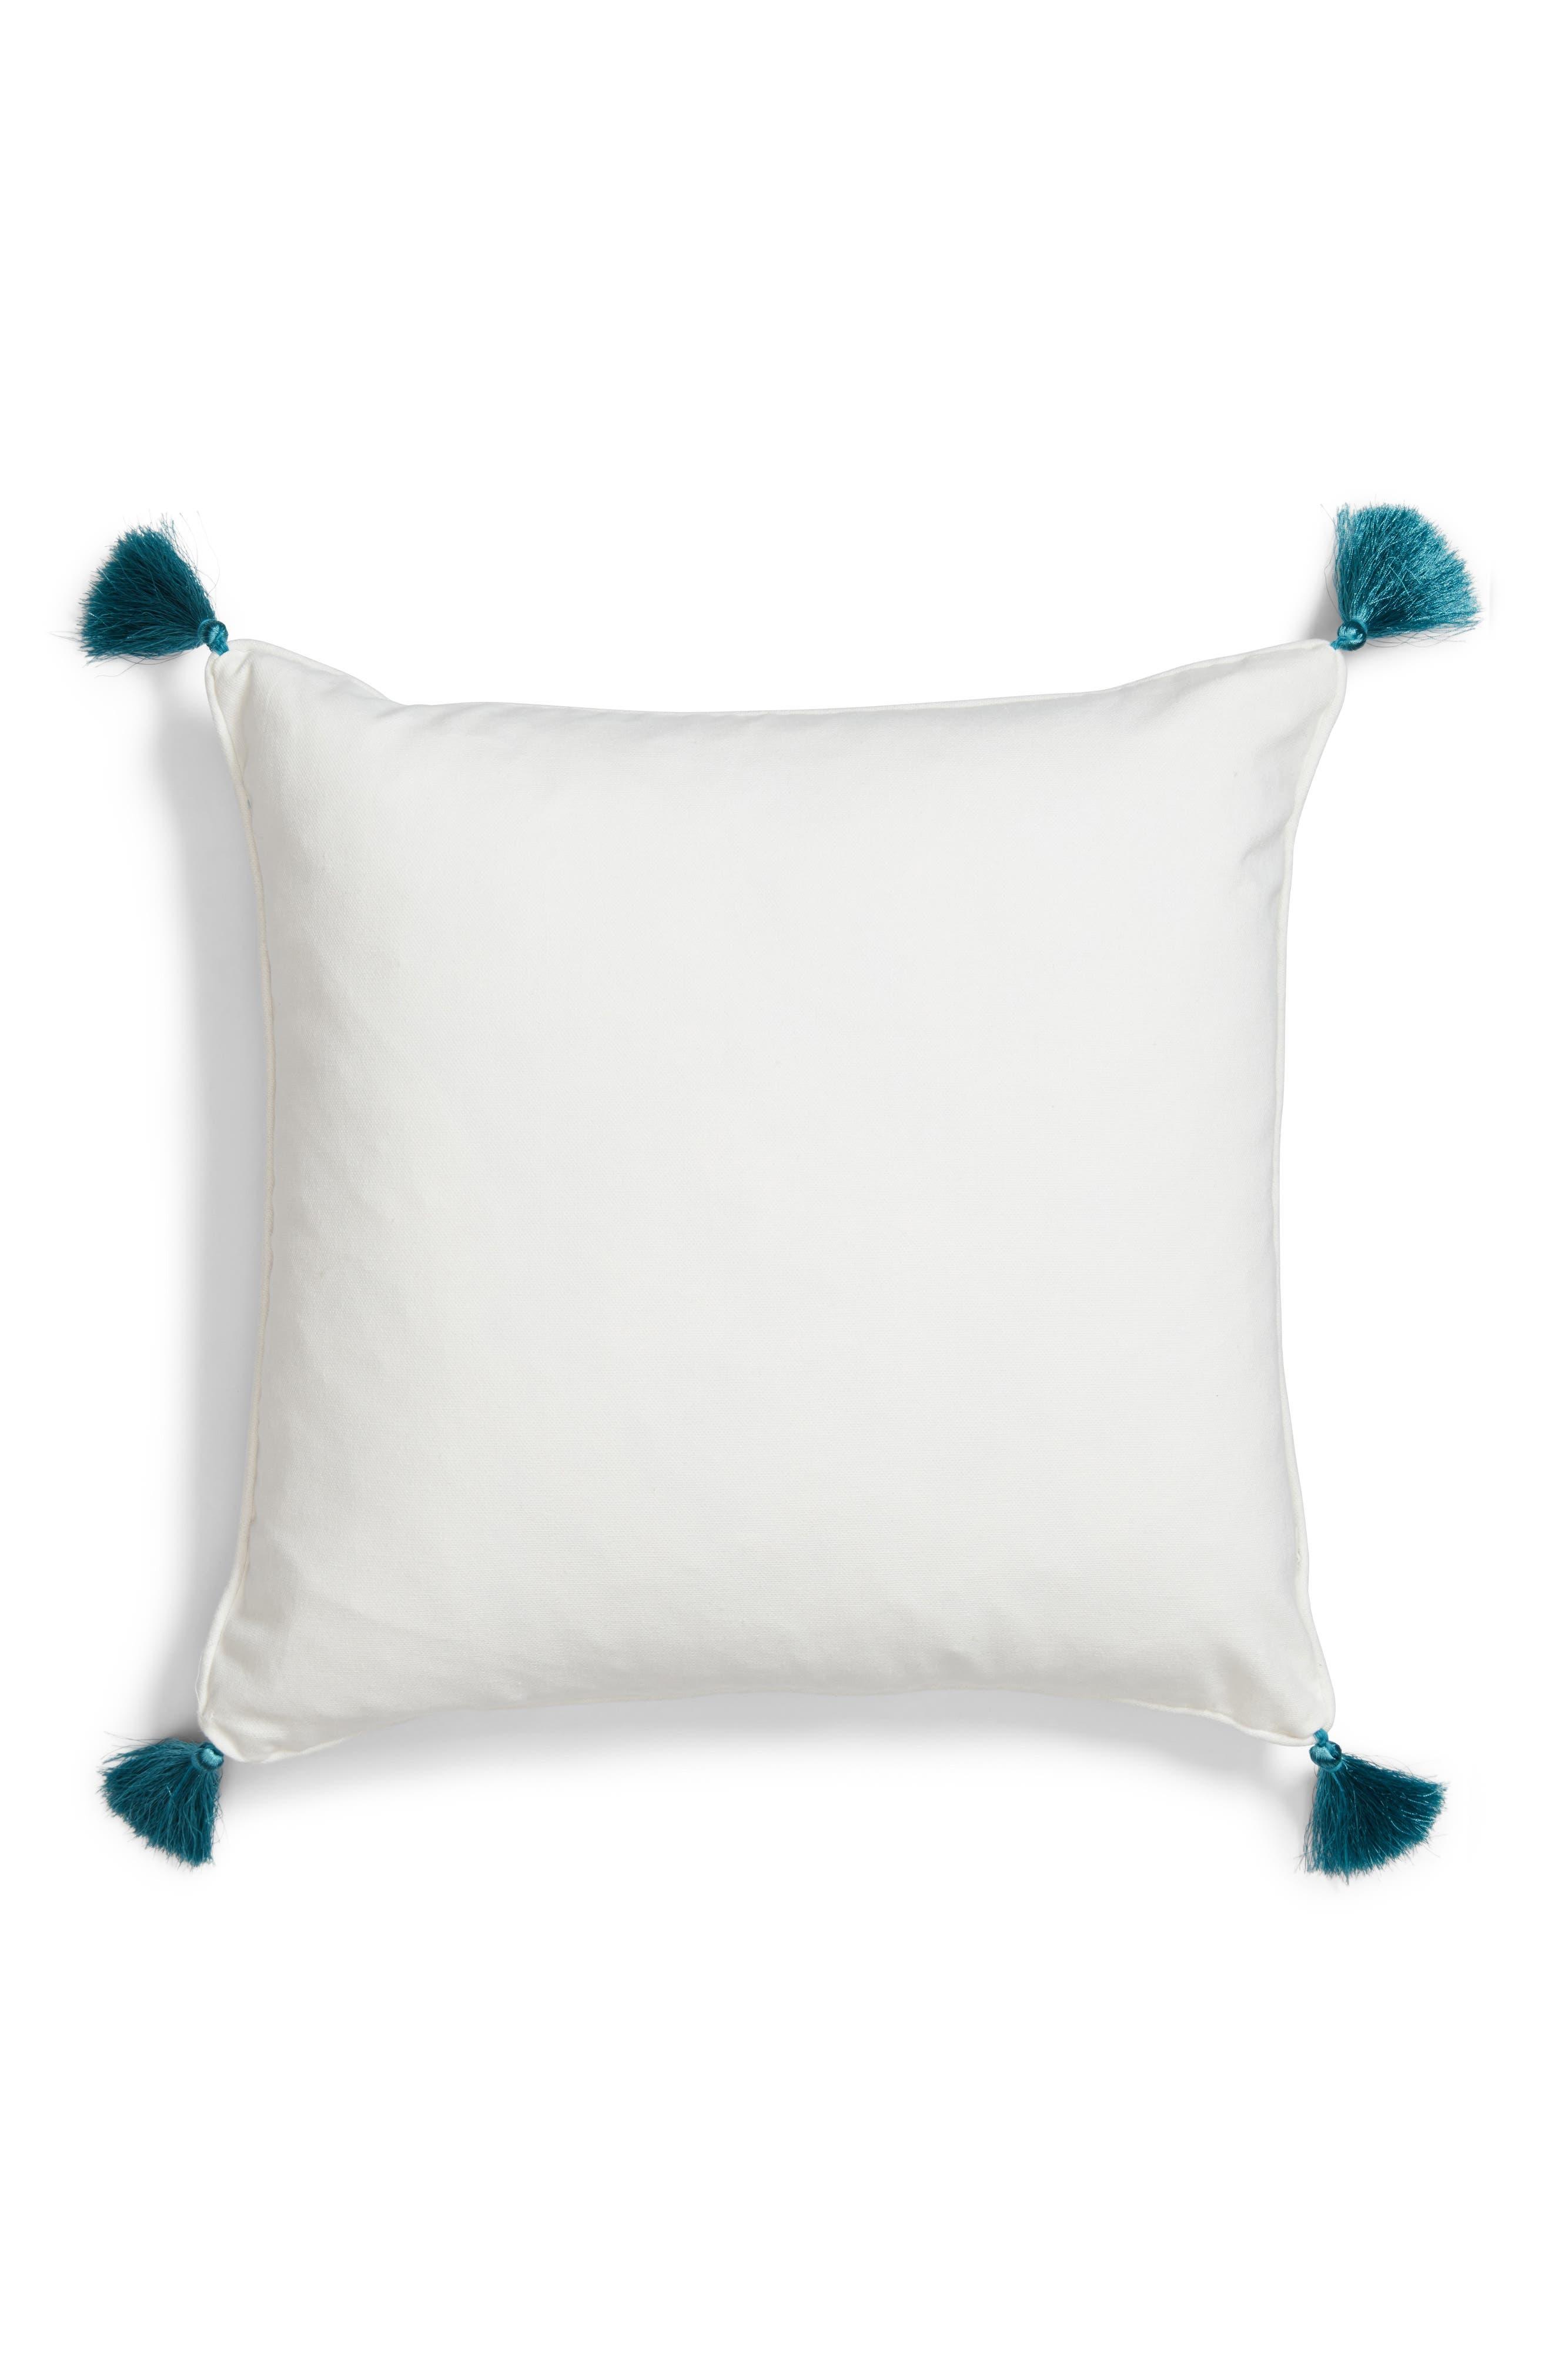 Luca Accent Pillow,                             Alternate thumbnail 2, color,                             300